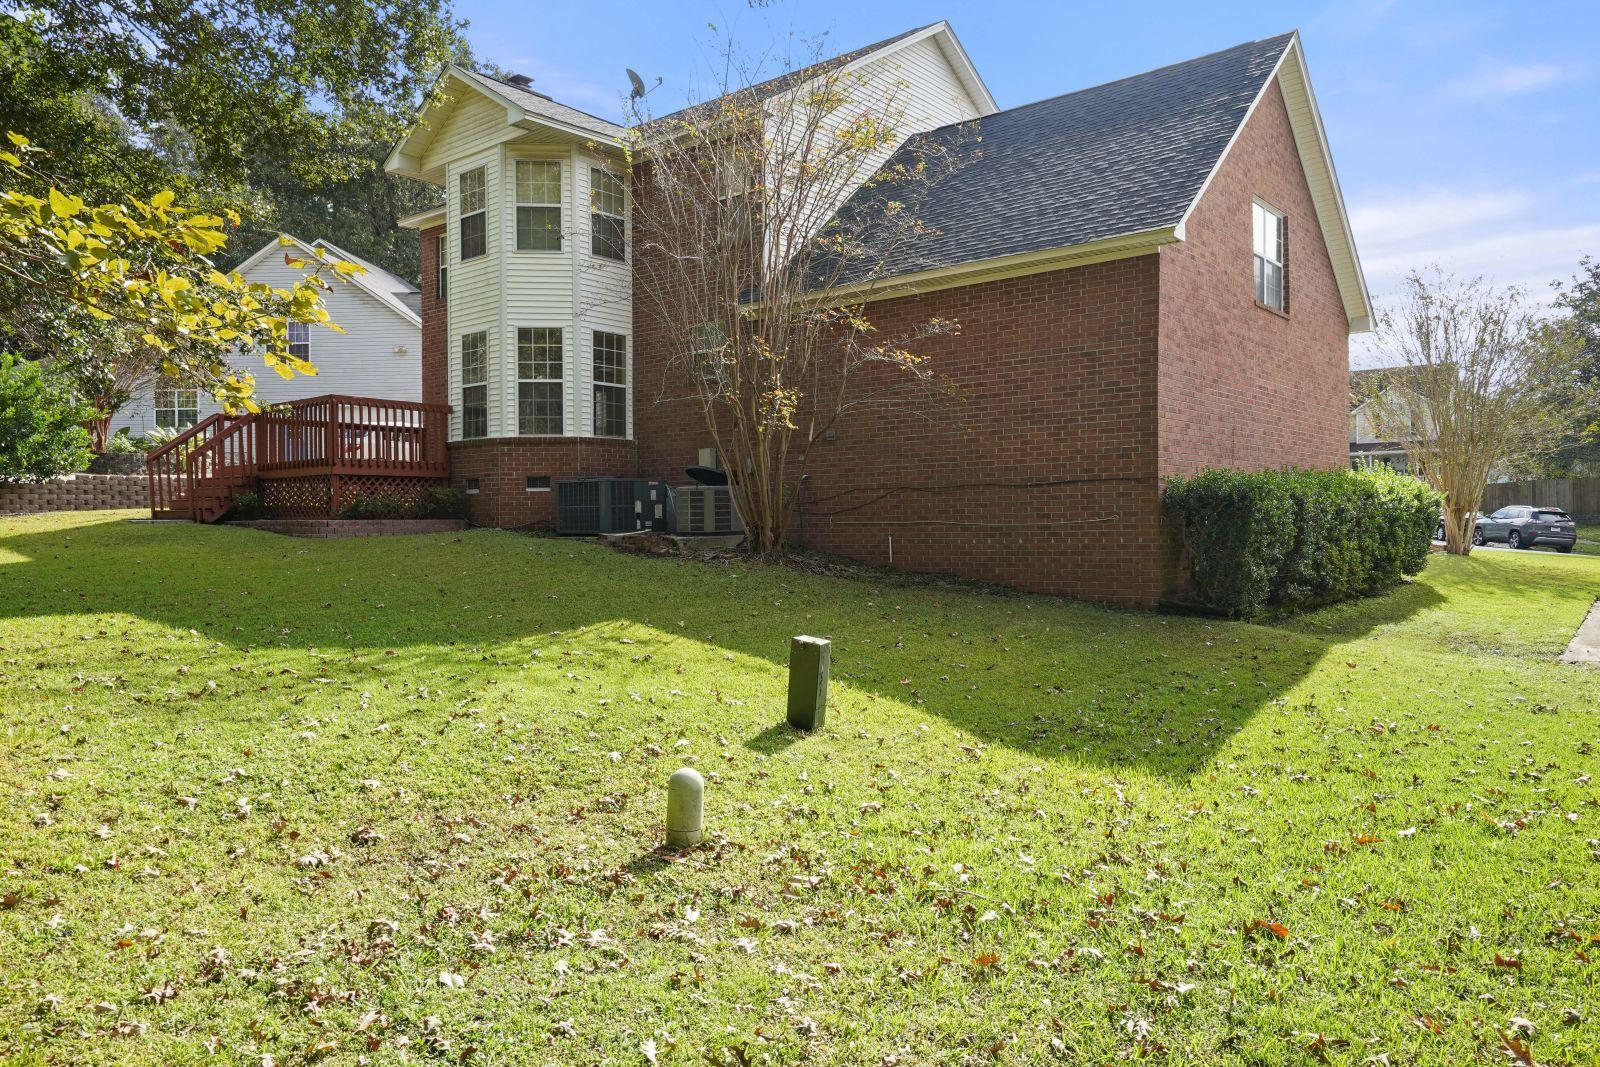 Crowfield Plantation Homes For Sale - 161 Belleplaine, Goose Creek, SC - 38